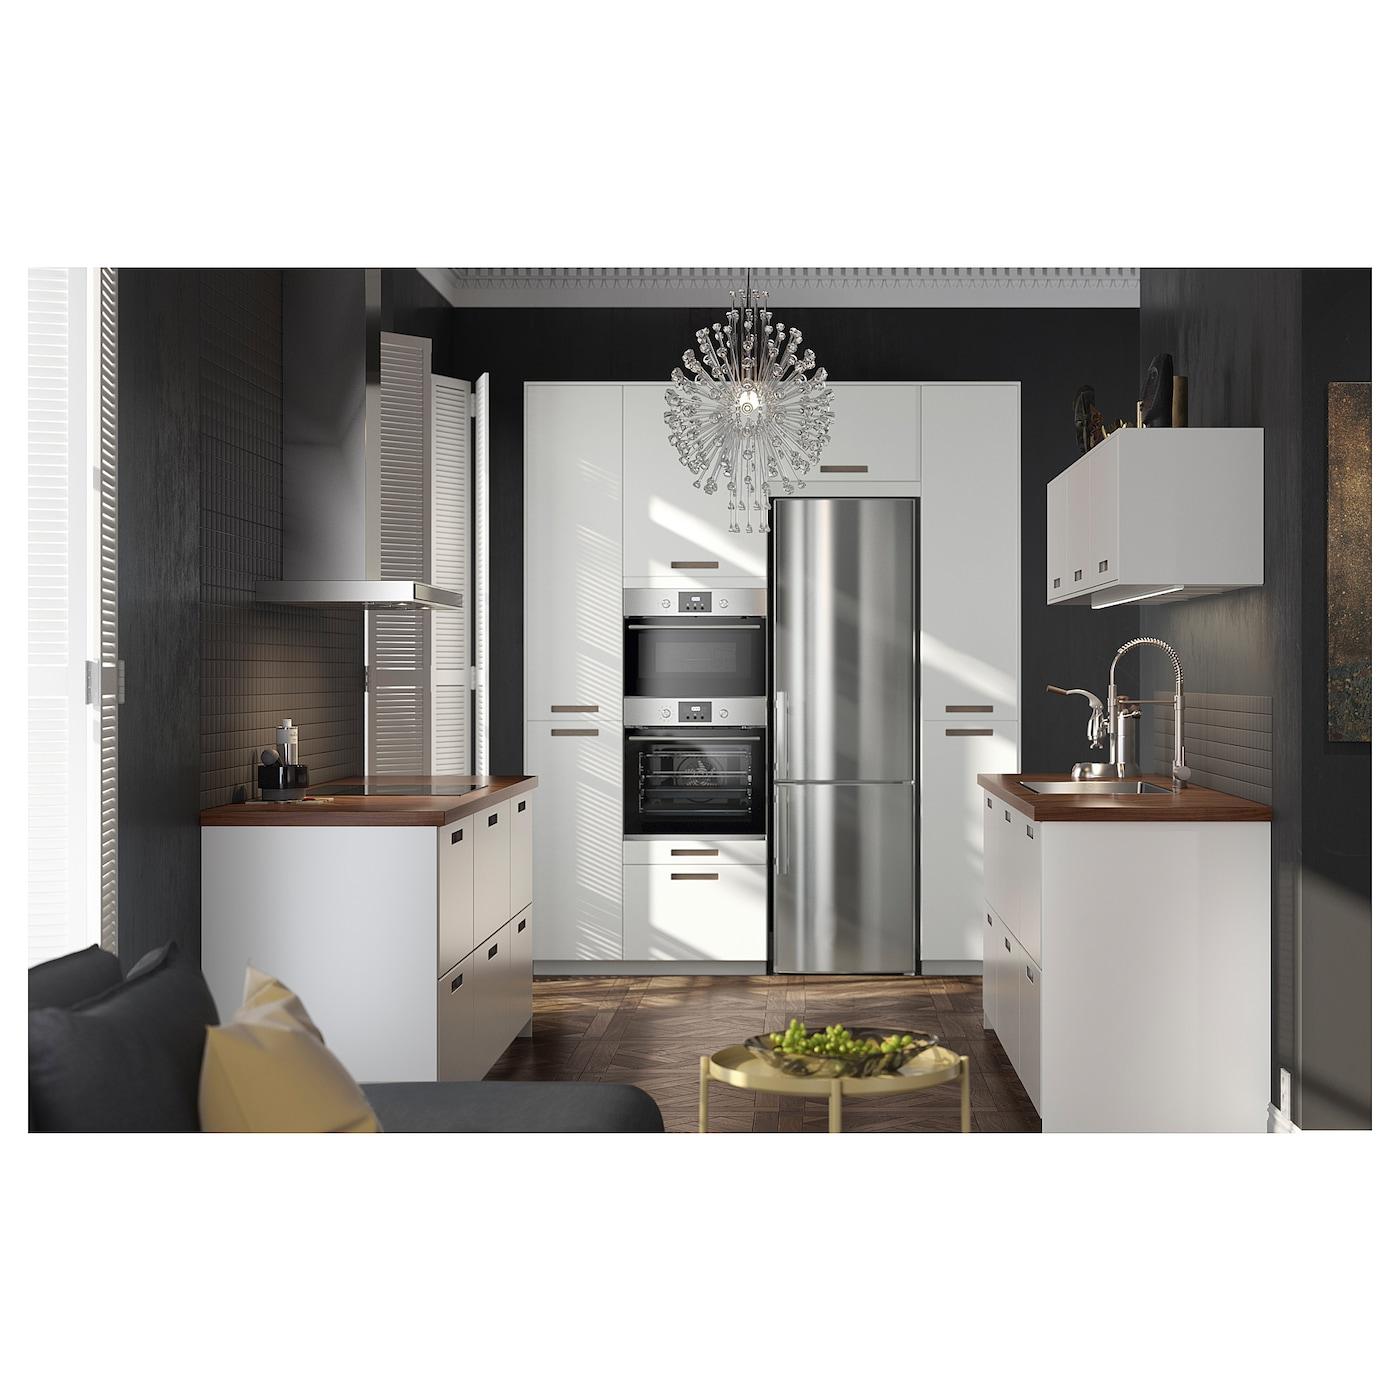 Walnut Mixed Material Ikea Kitchen: BARKABODA Worktop Walnut 186 X 3.8 Cm